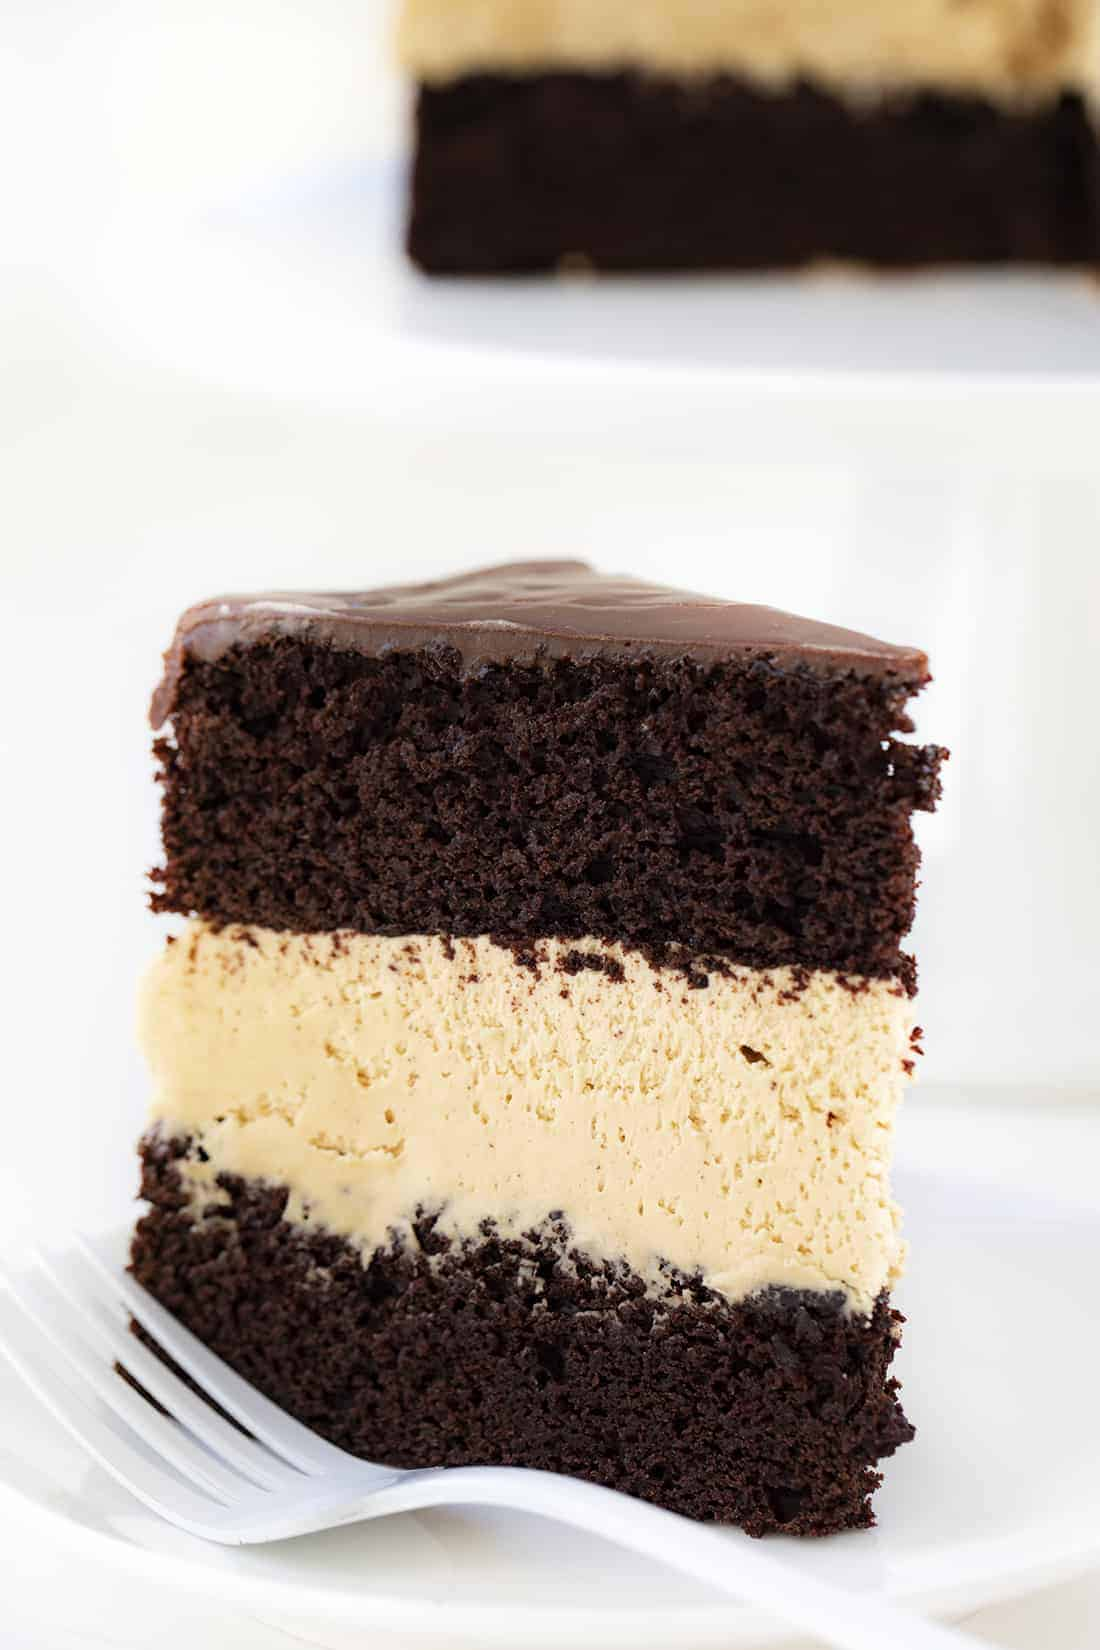 Piece of Biscoff Buckeye Cake on White Plate